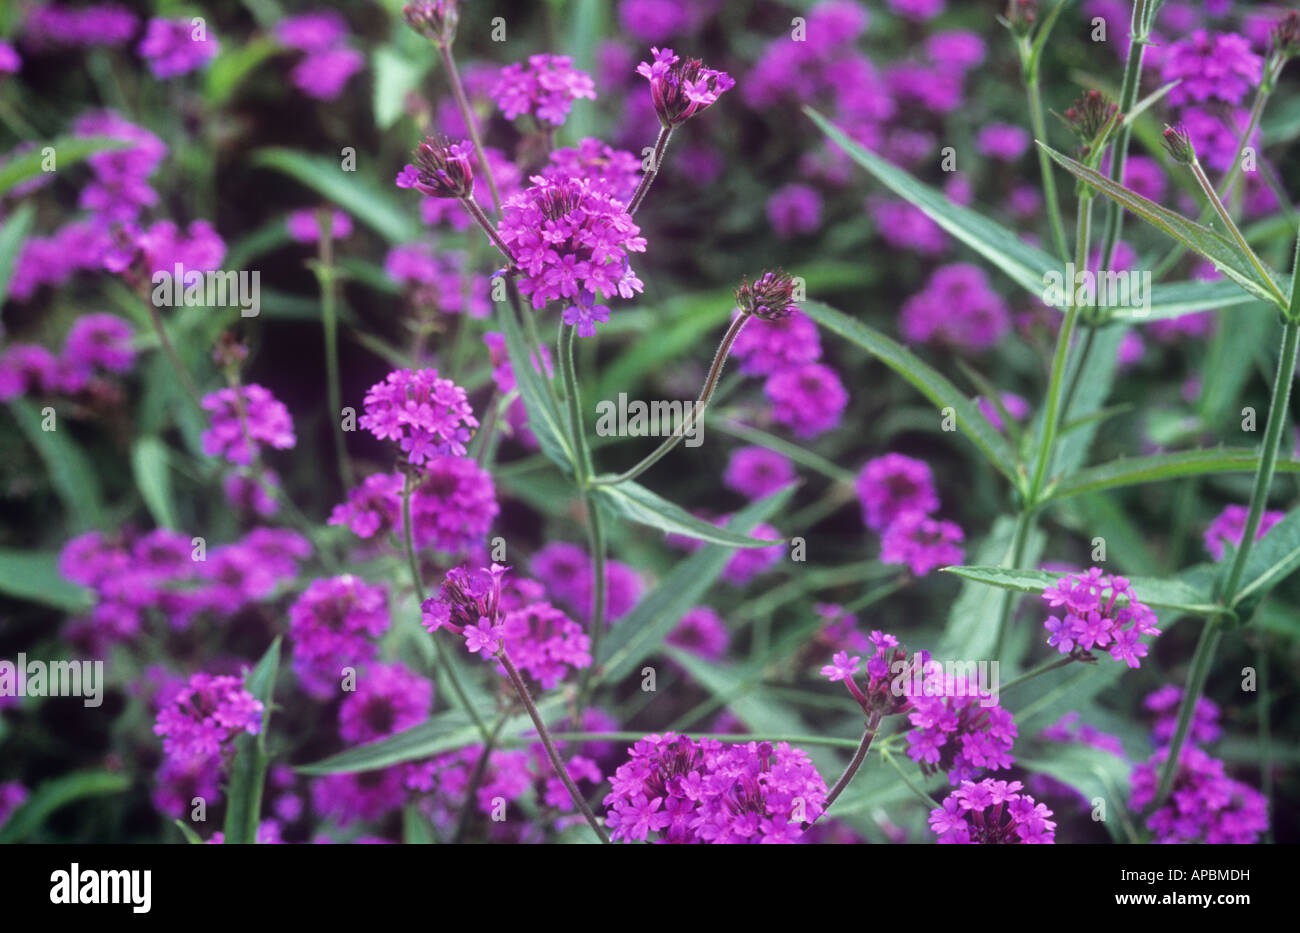 Stems of tiny pink purple flowers of verbena bonariensis patagonica stems of tiny pink purple flowers of verbena bonariensis patagonica with dark green lance shaped leaves mightylinksfo